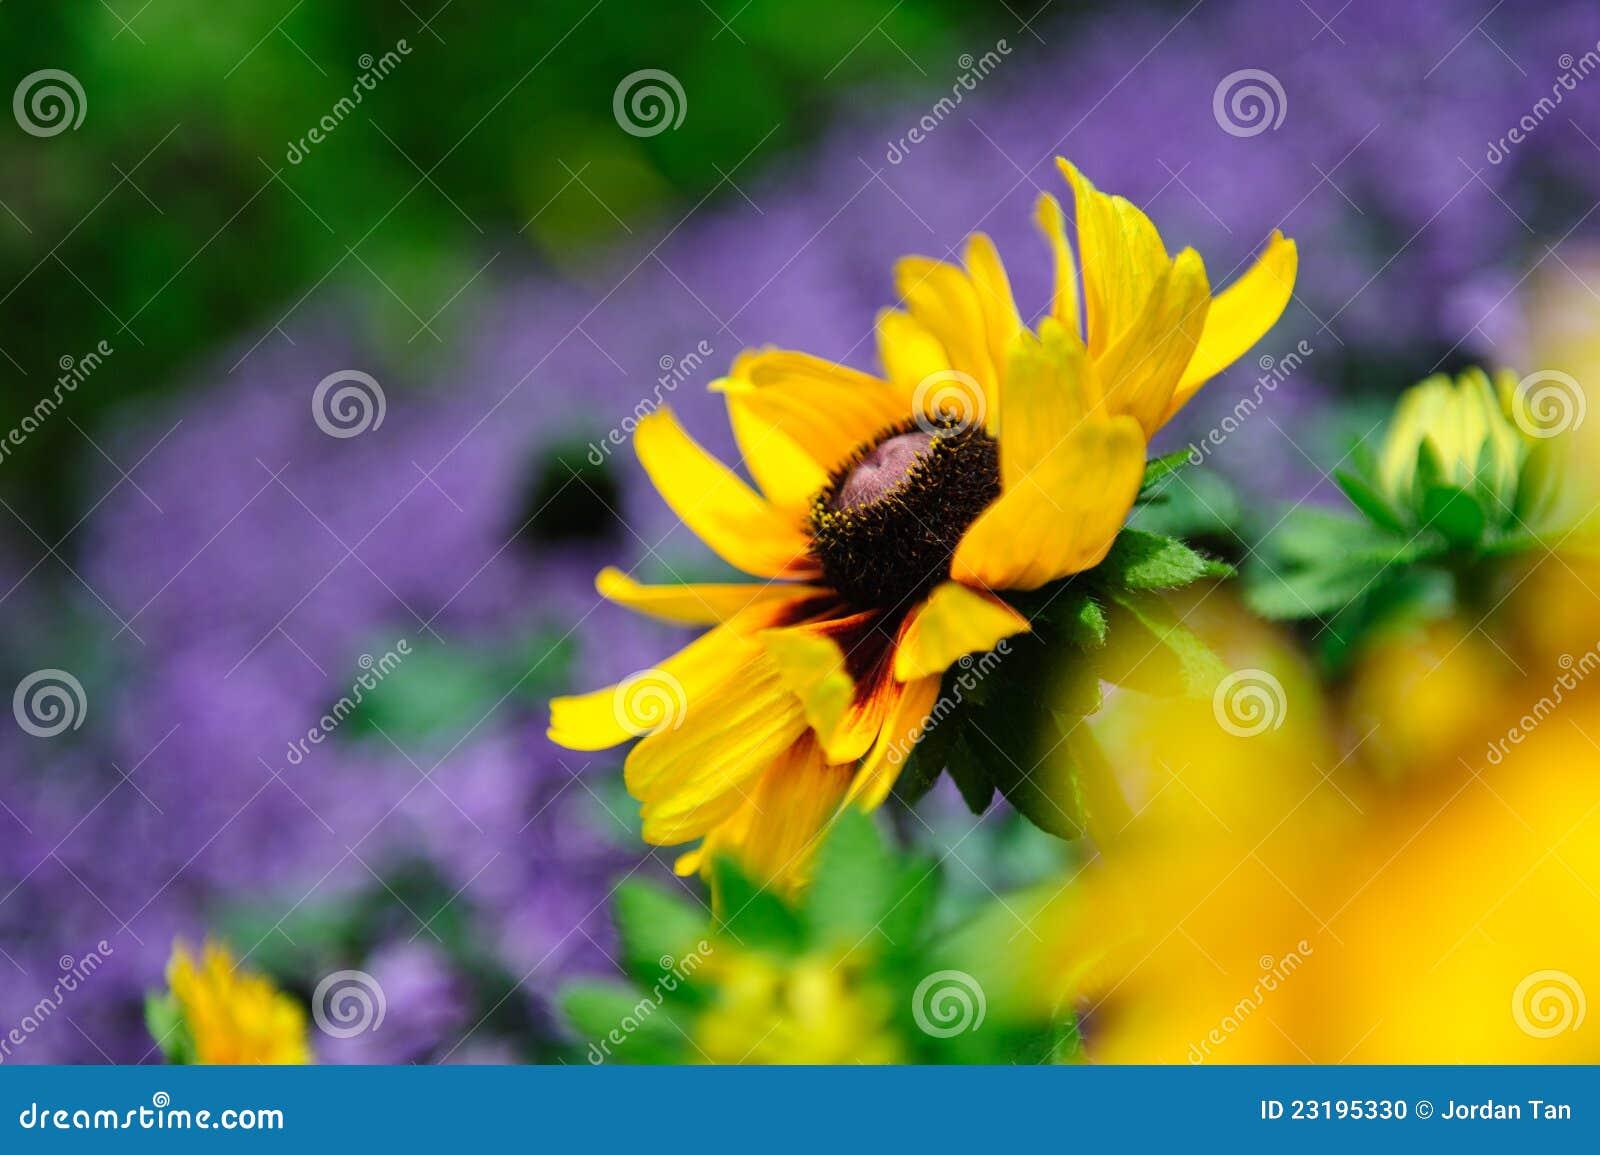 flor de jardim amarela:Vibrant Yellow Flowers